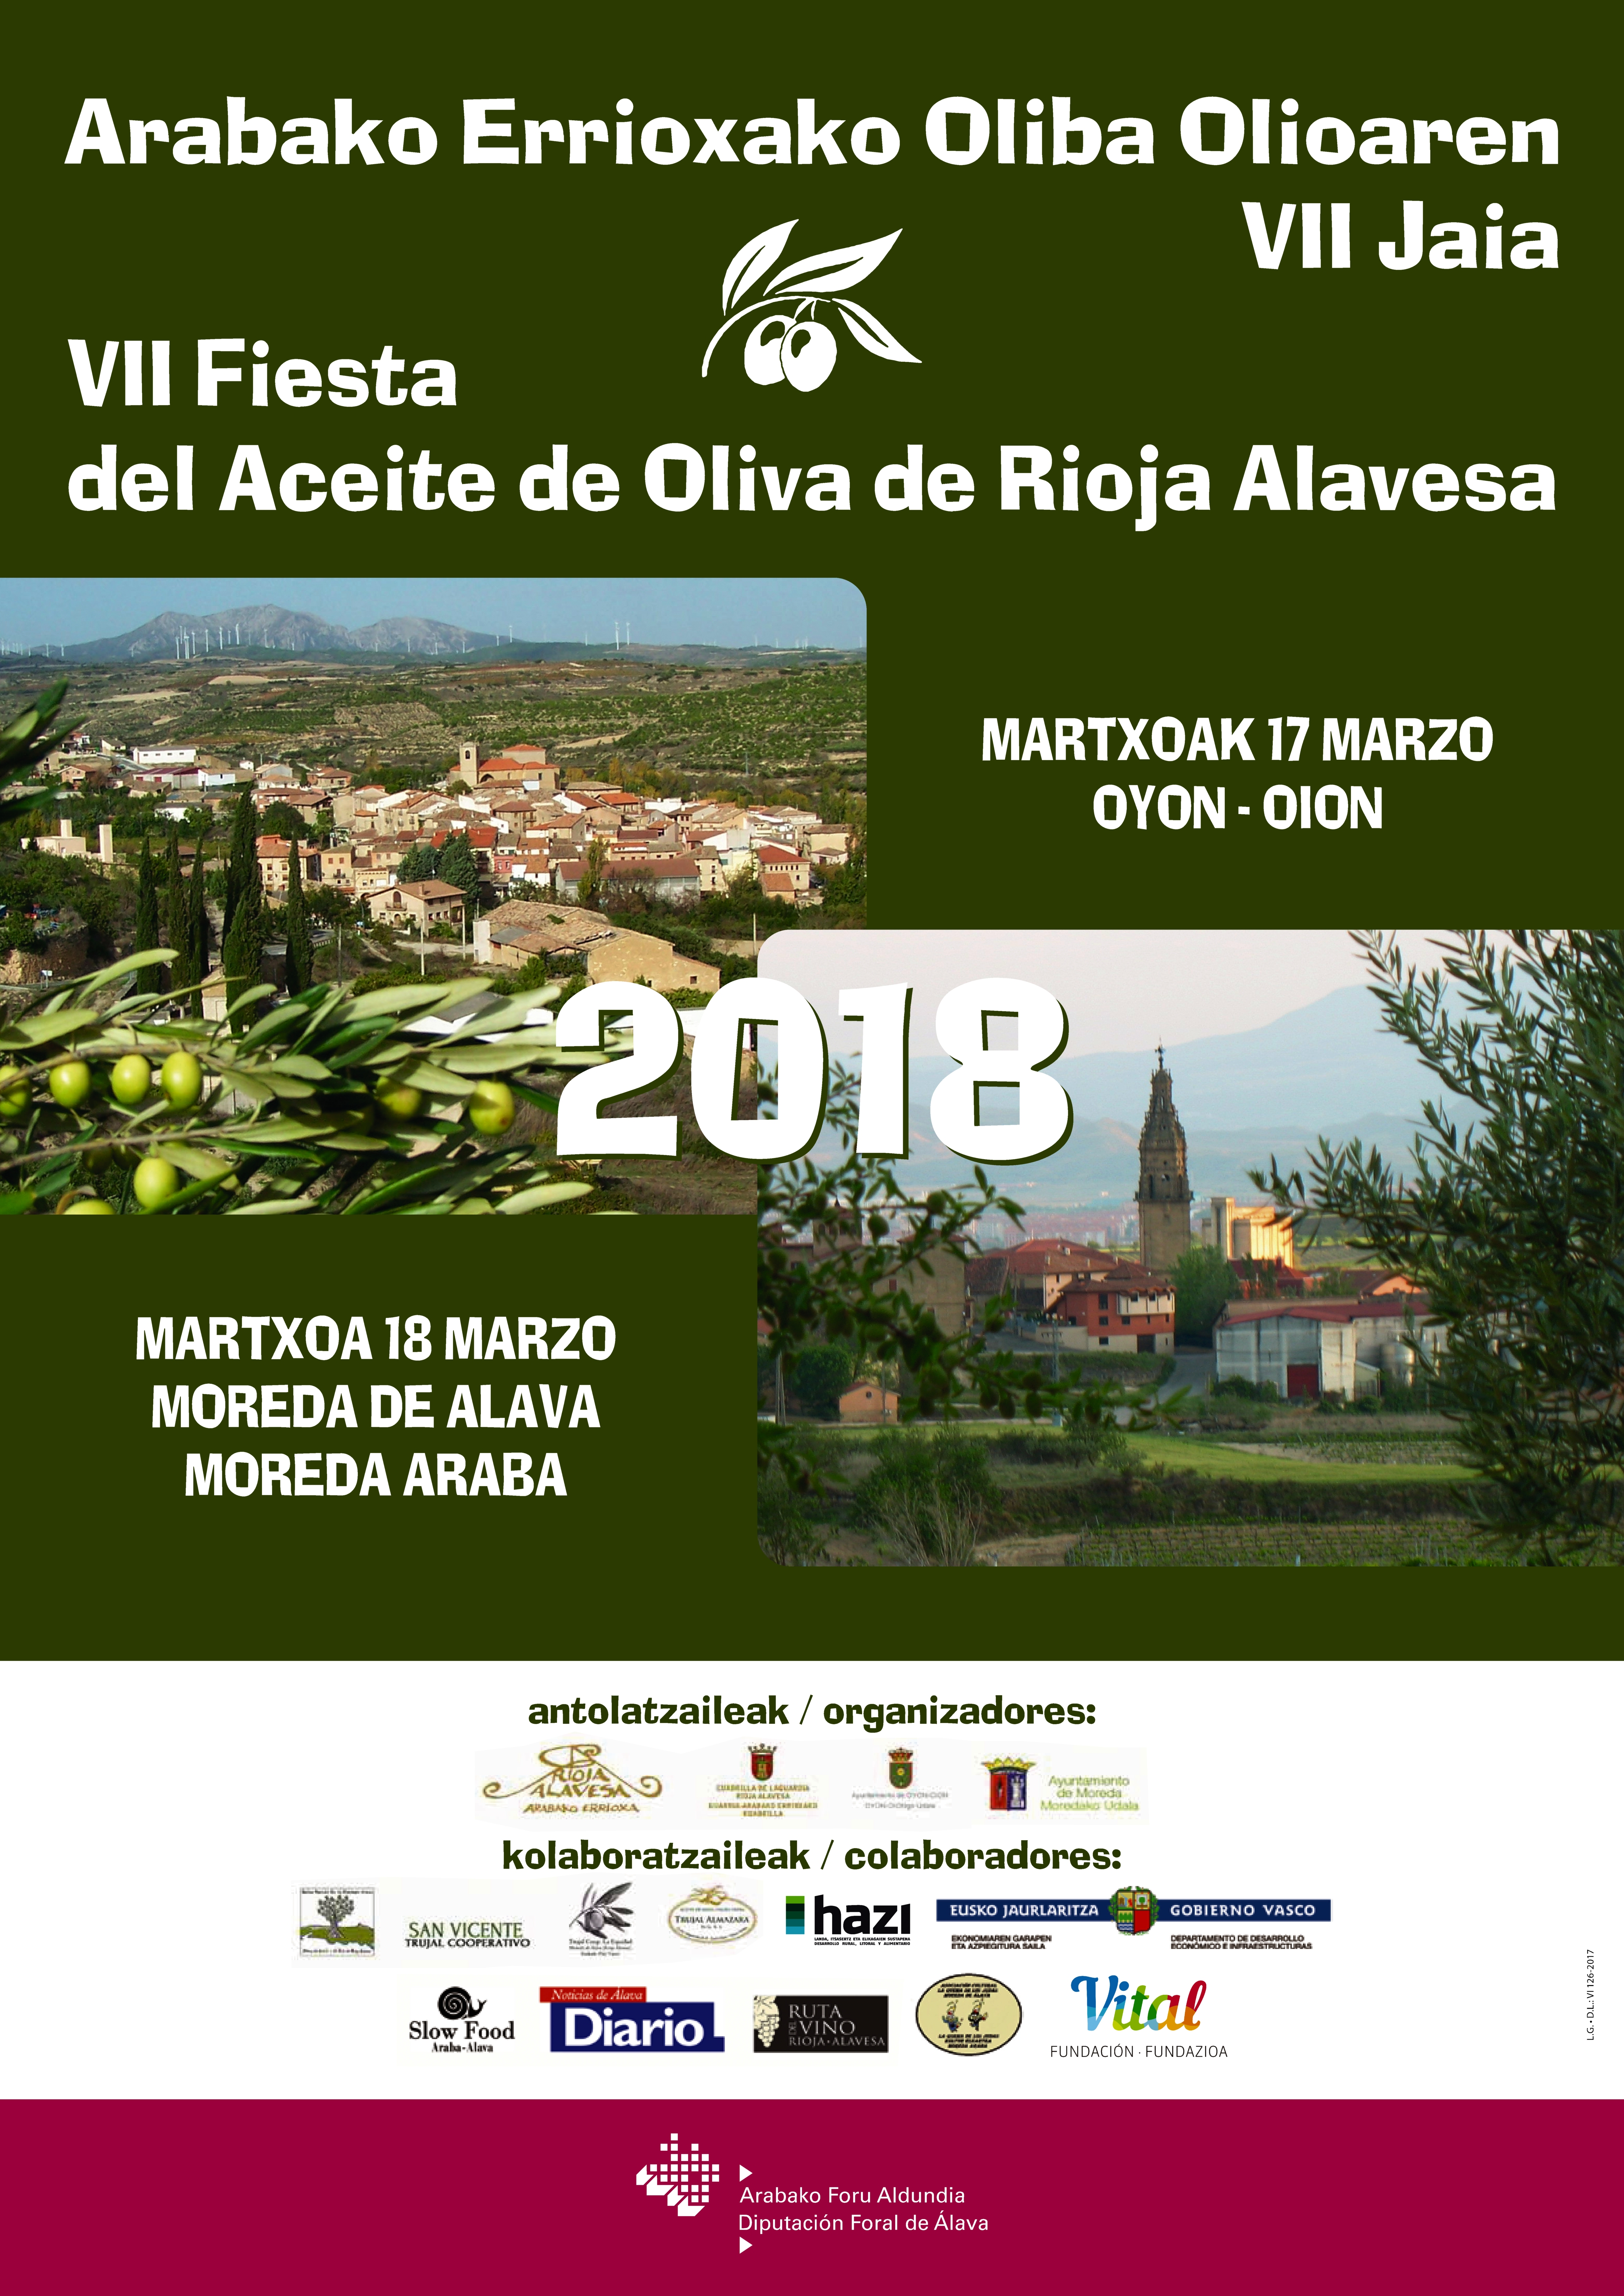 fiesta aceite de oliva de rioja alavesa 2018